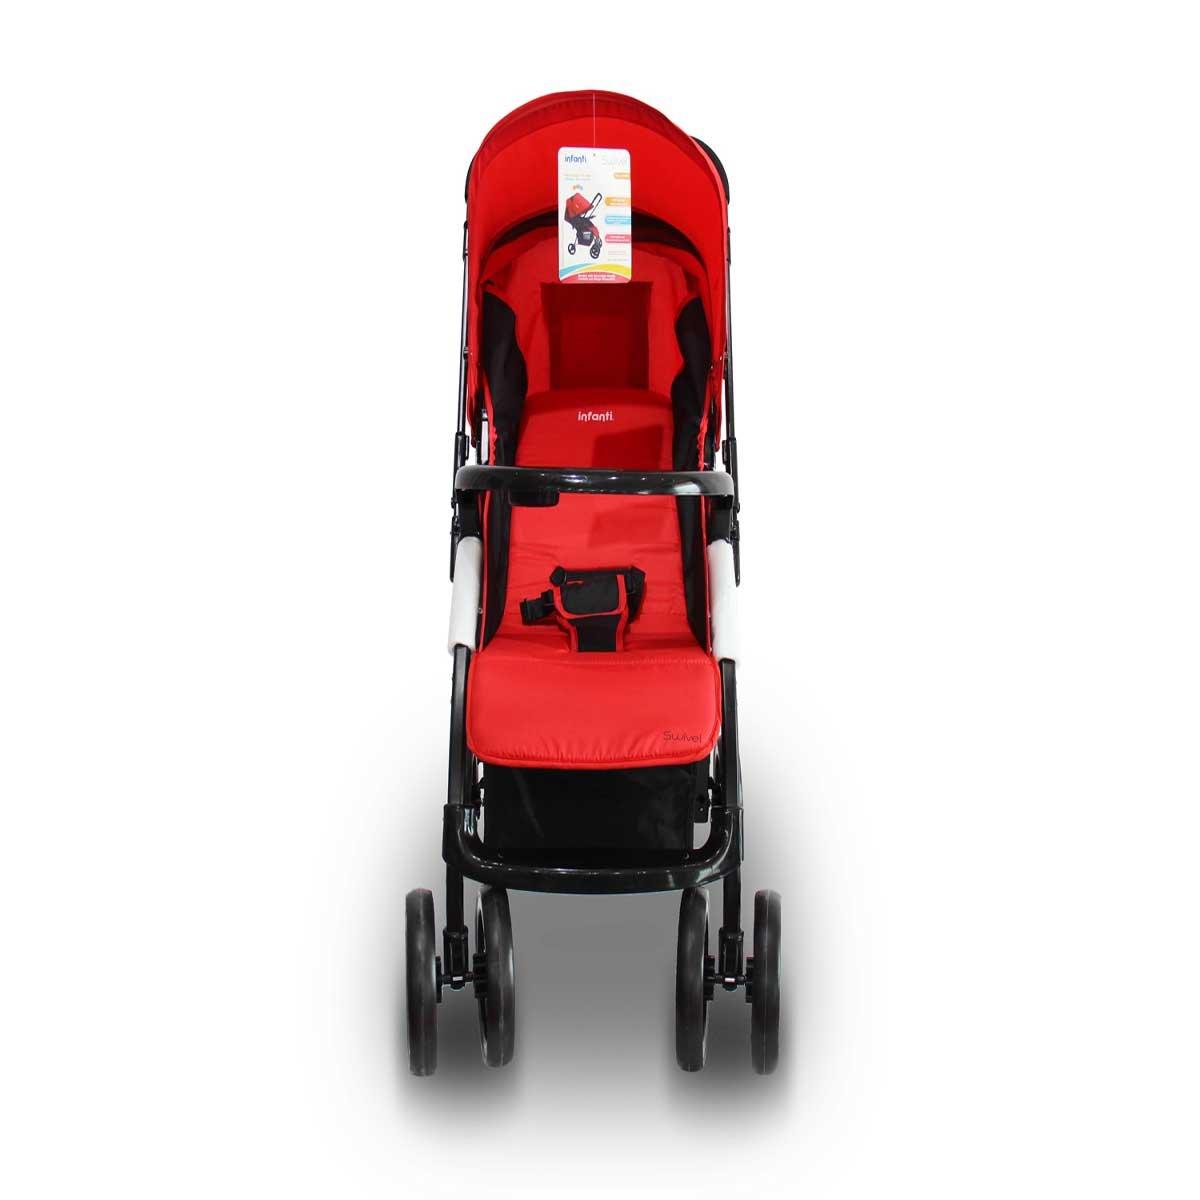 7cfe4ed6c Carriola Mango Reversible Swivel Crimson Infanti | SEARS.COM.MX - Me ...